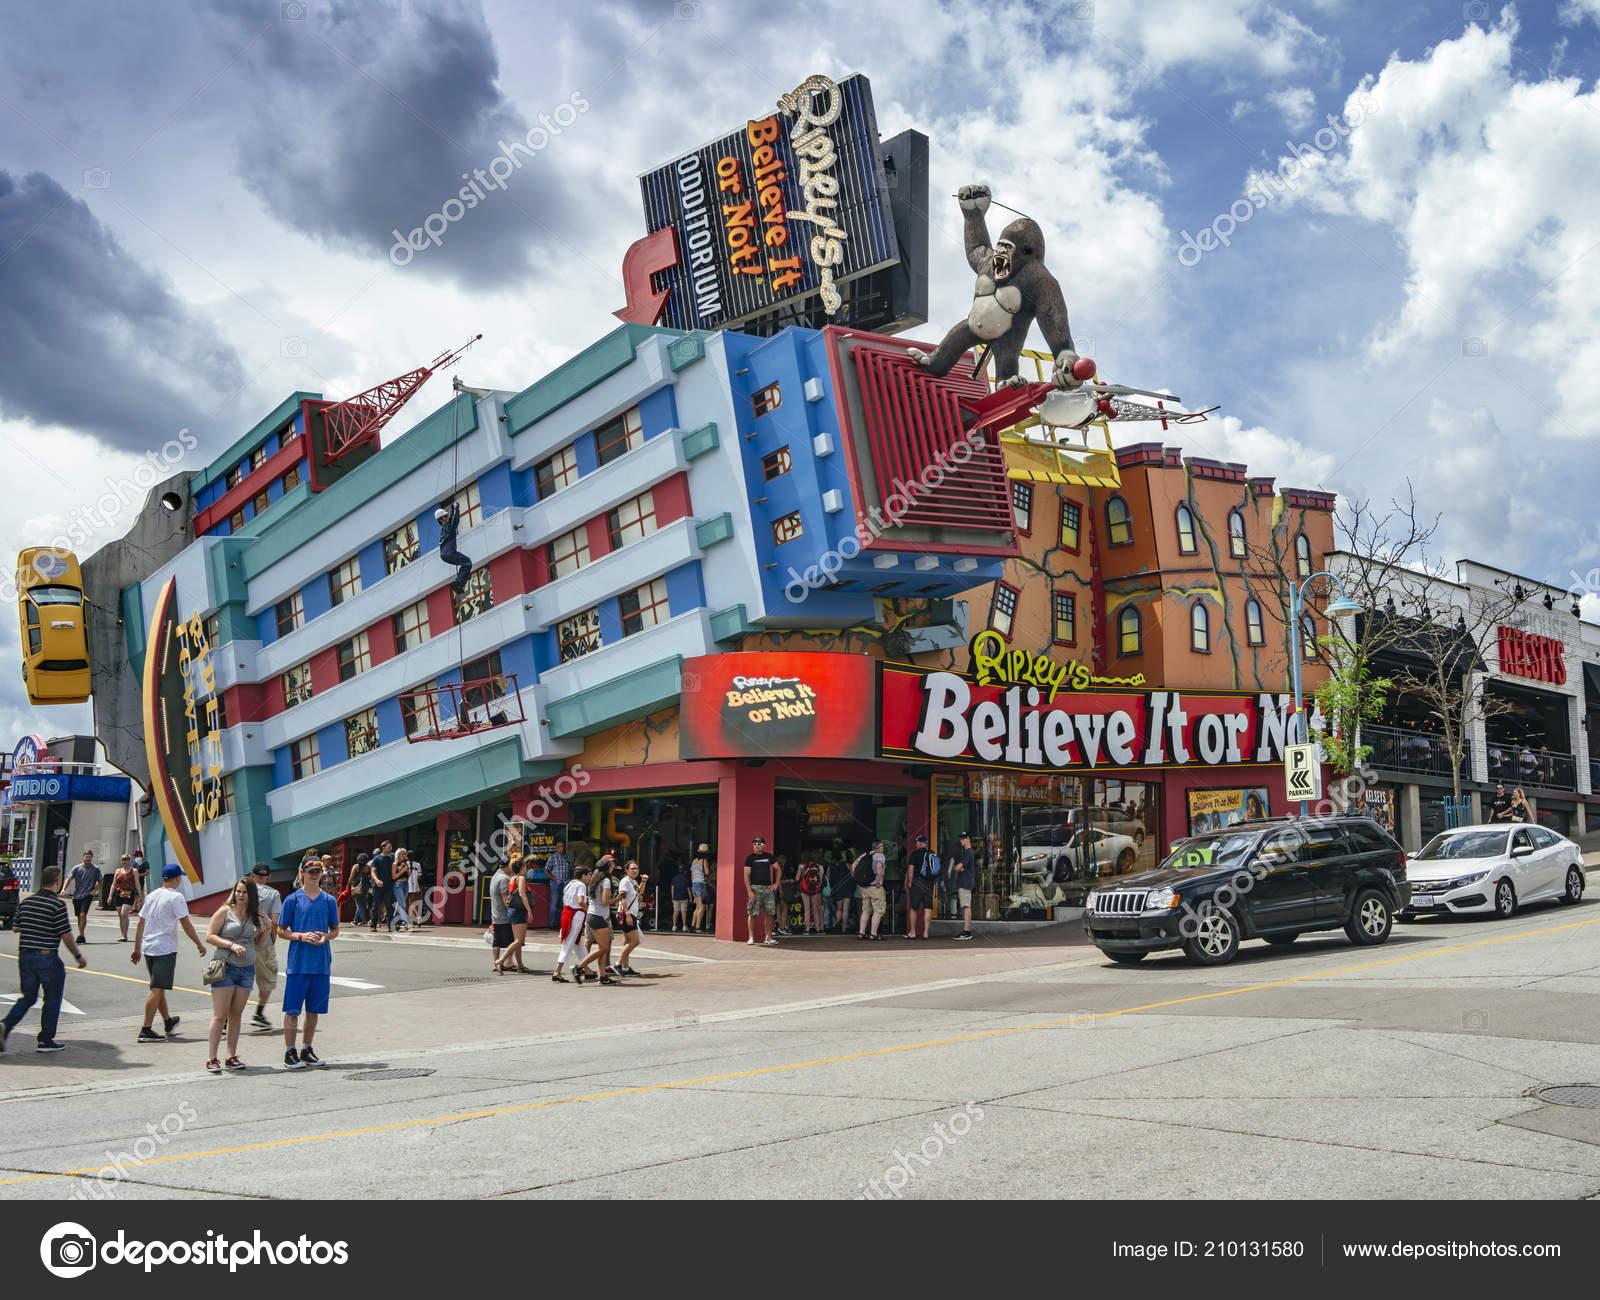 Niagara Falls Ontario Canada July 2018 Ripley Believe